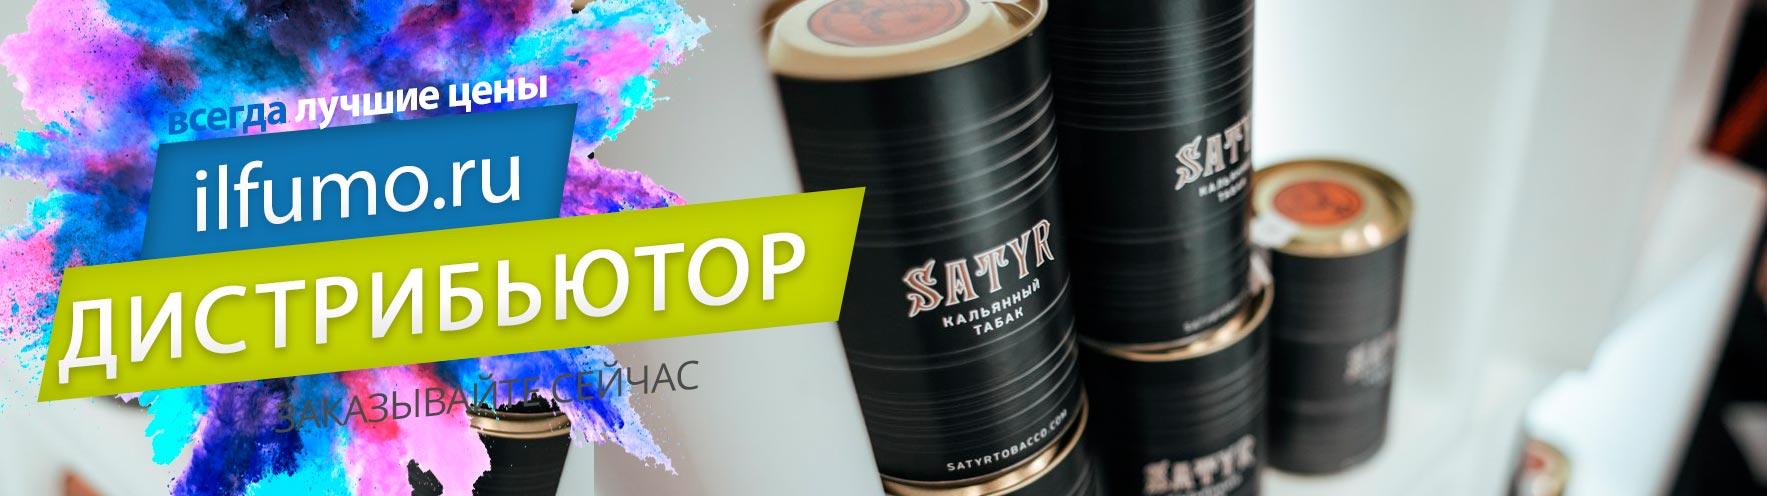 Satyr оптом по ценам производителя в ilfumo